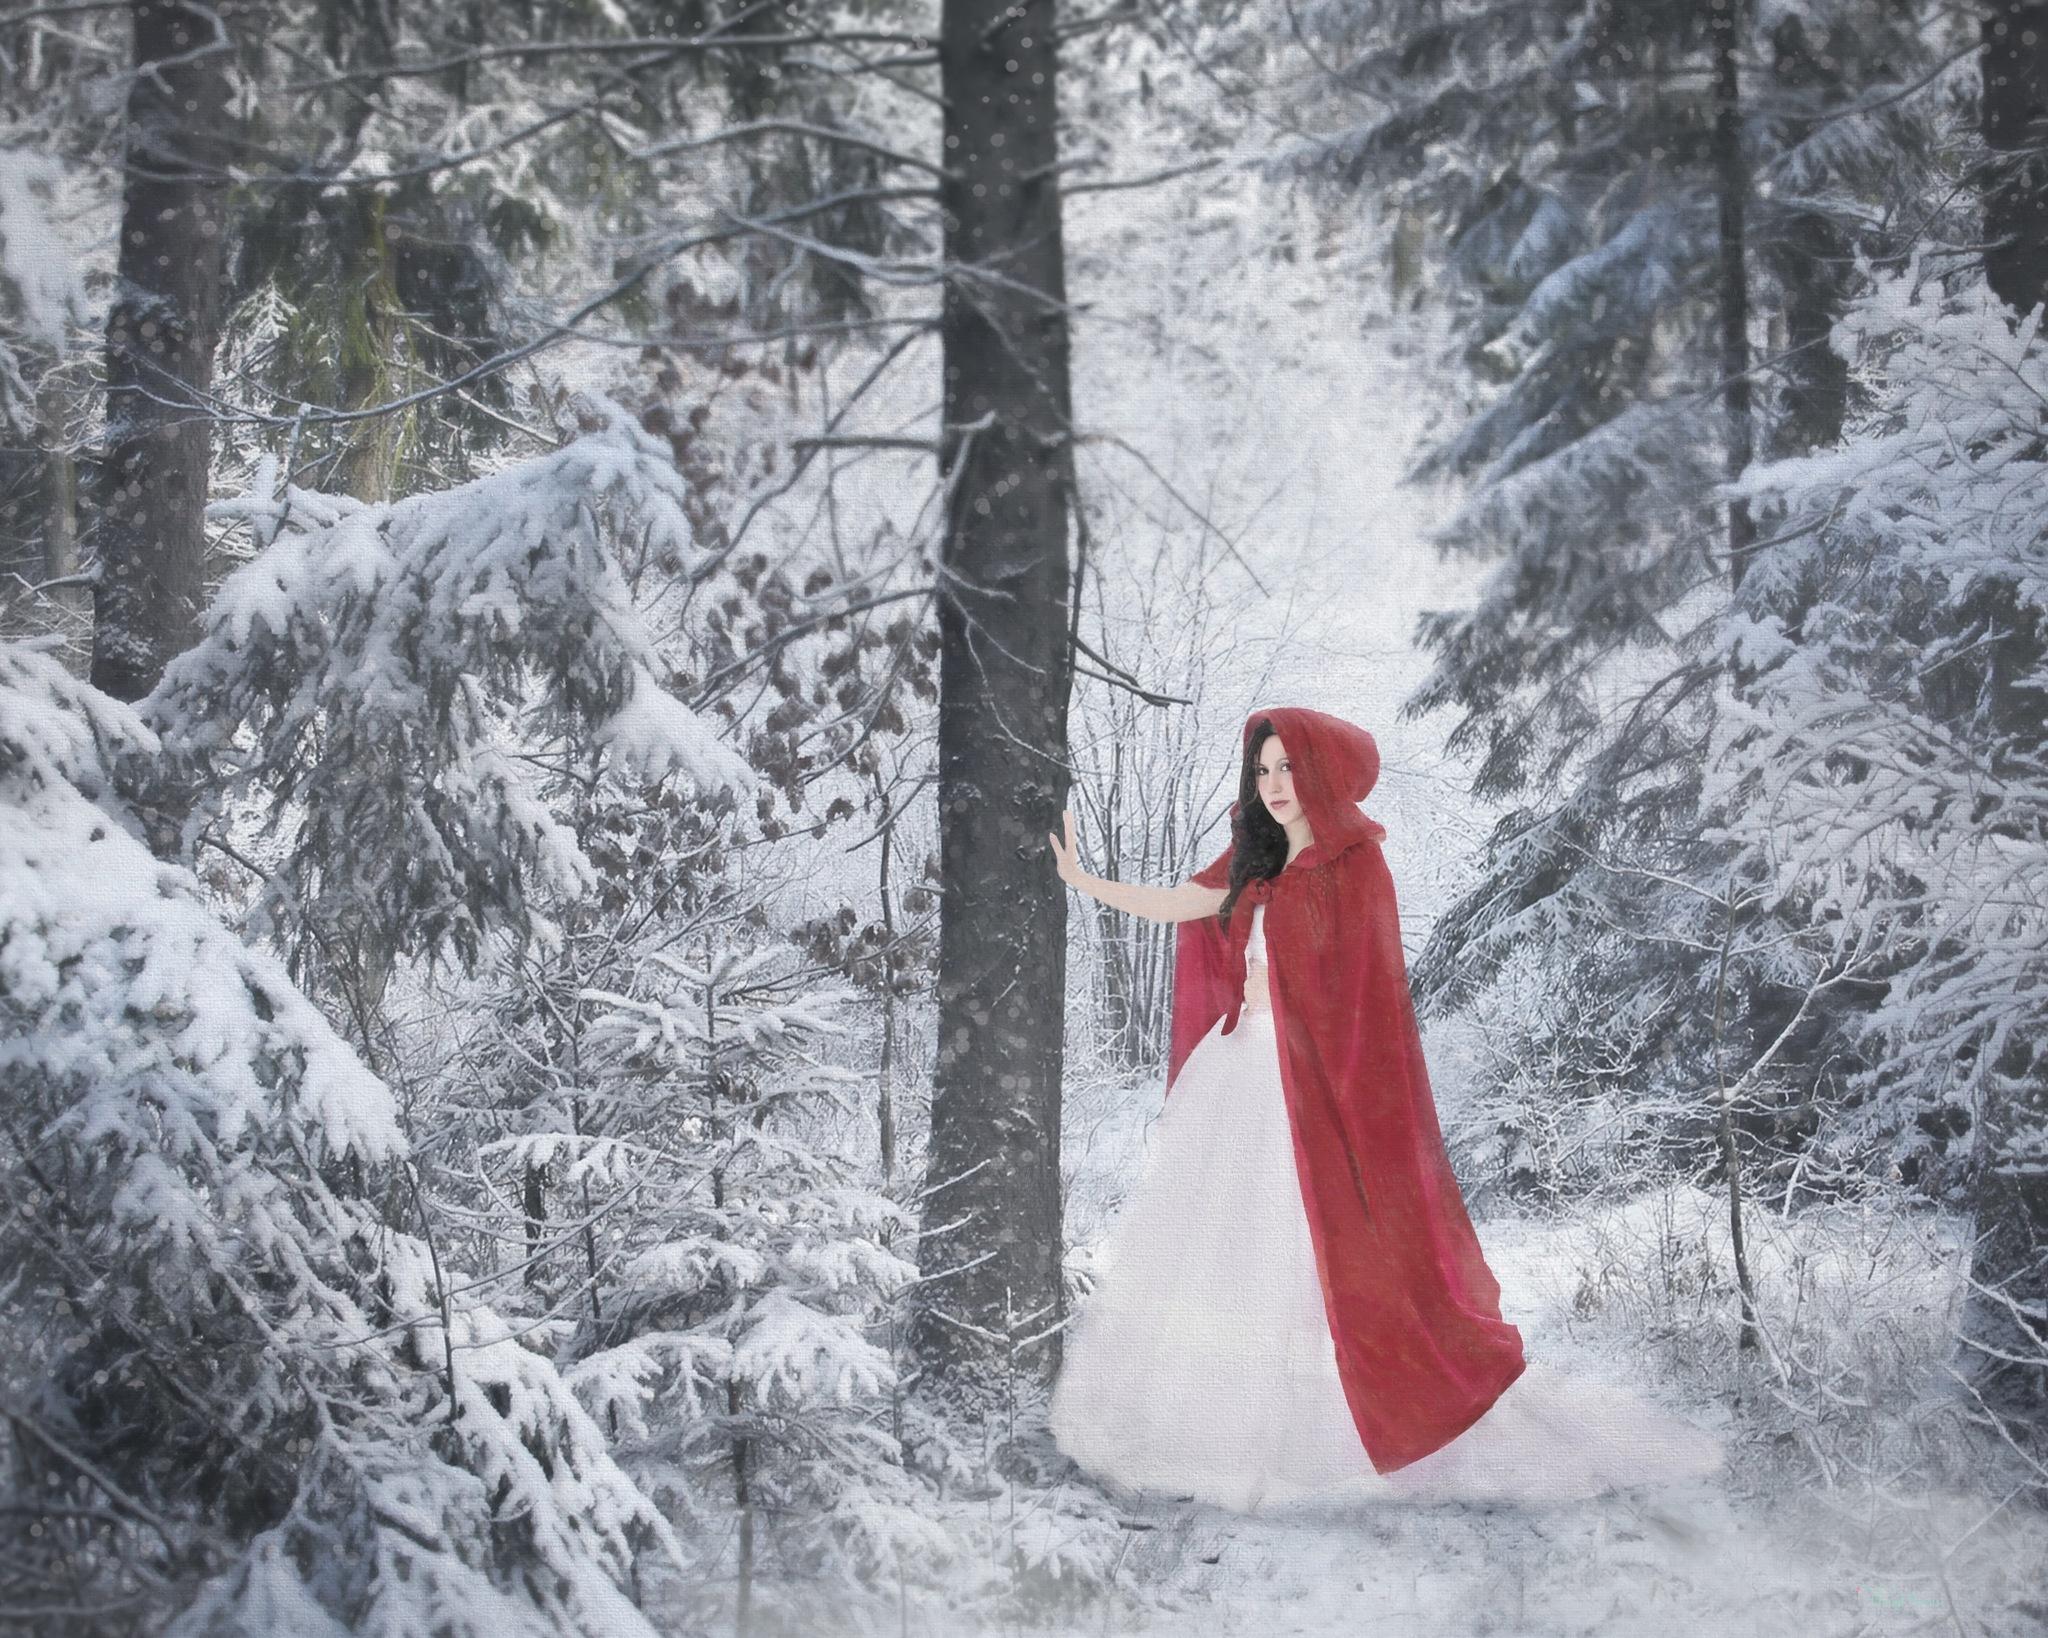 Red Riding Hood by Cherbeni